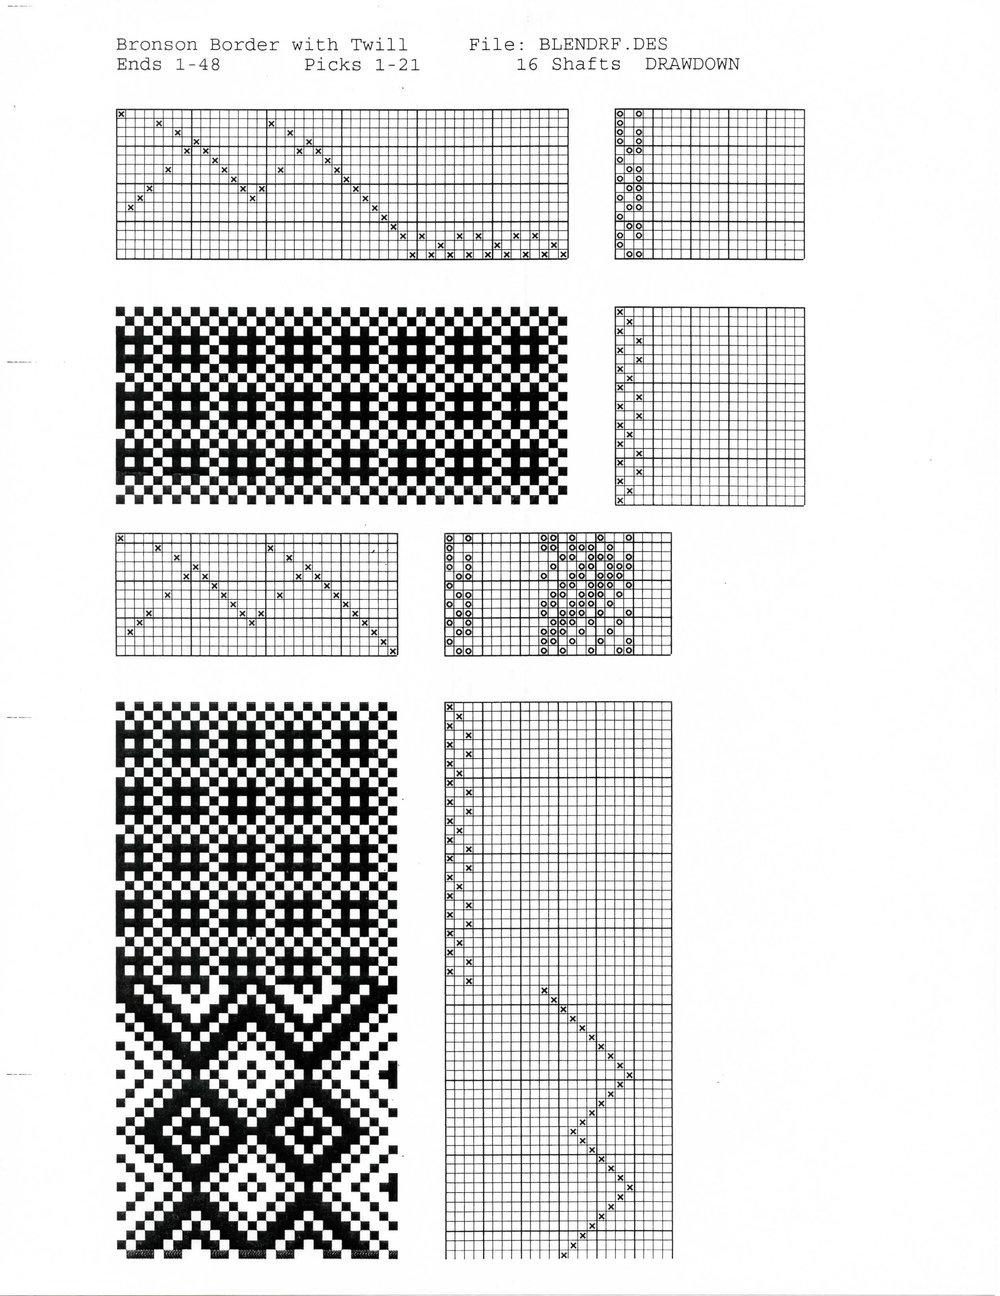 2002_Page_2_Image_0001.jpg